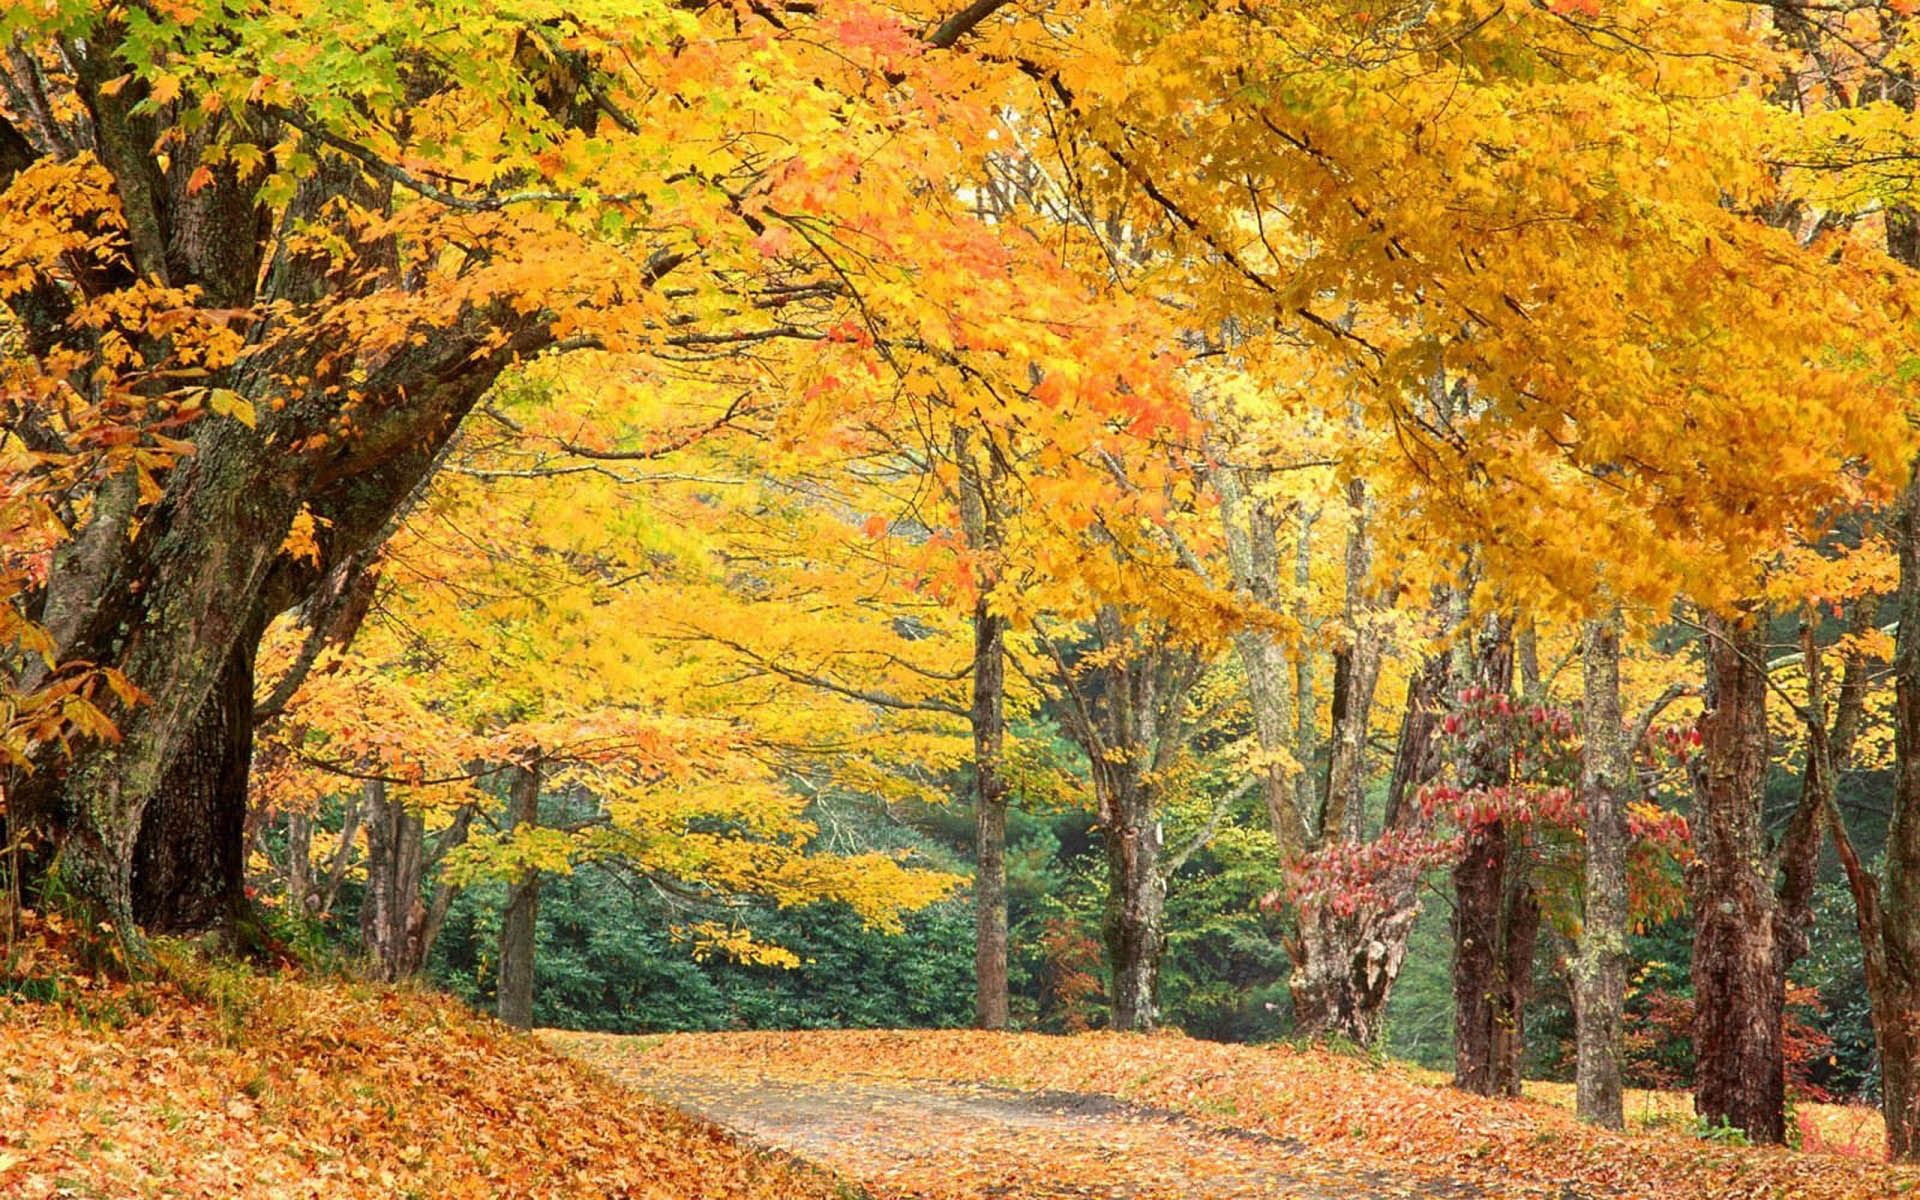 Autumn Scenes HD Walls Find Wallpapers 1920x1200